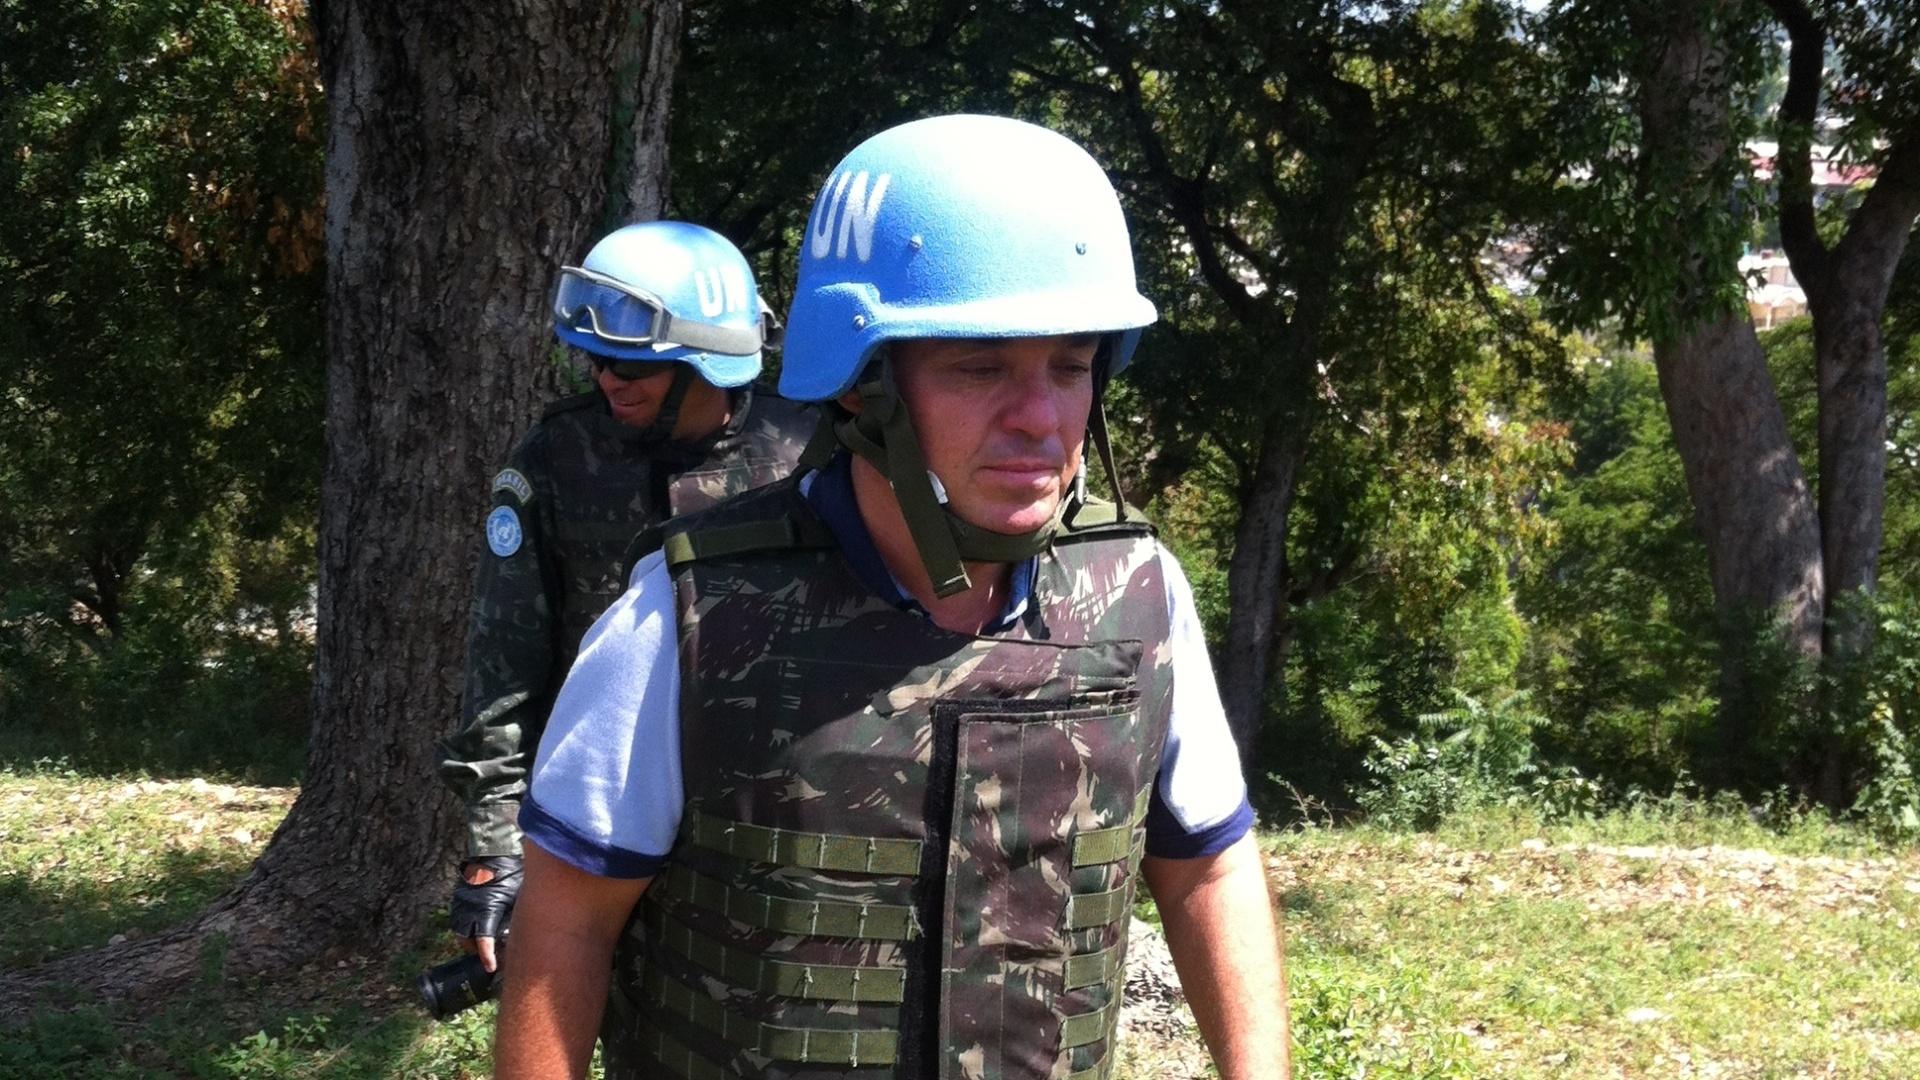 Gugu Liberato foi ao Haiti gravar matérias especiais do seu programa (outubro/2012)